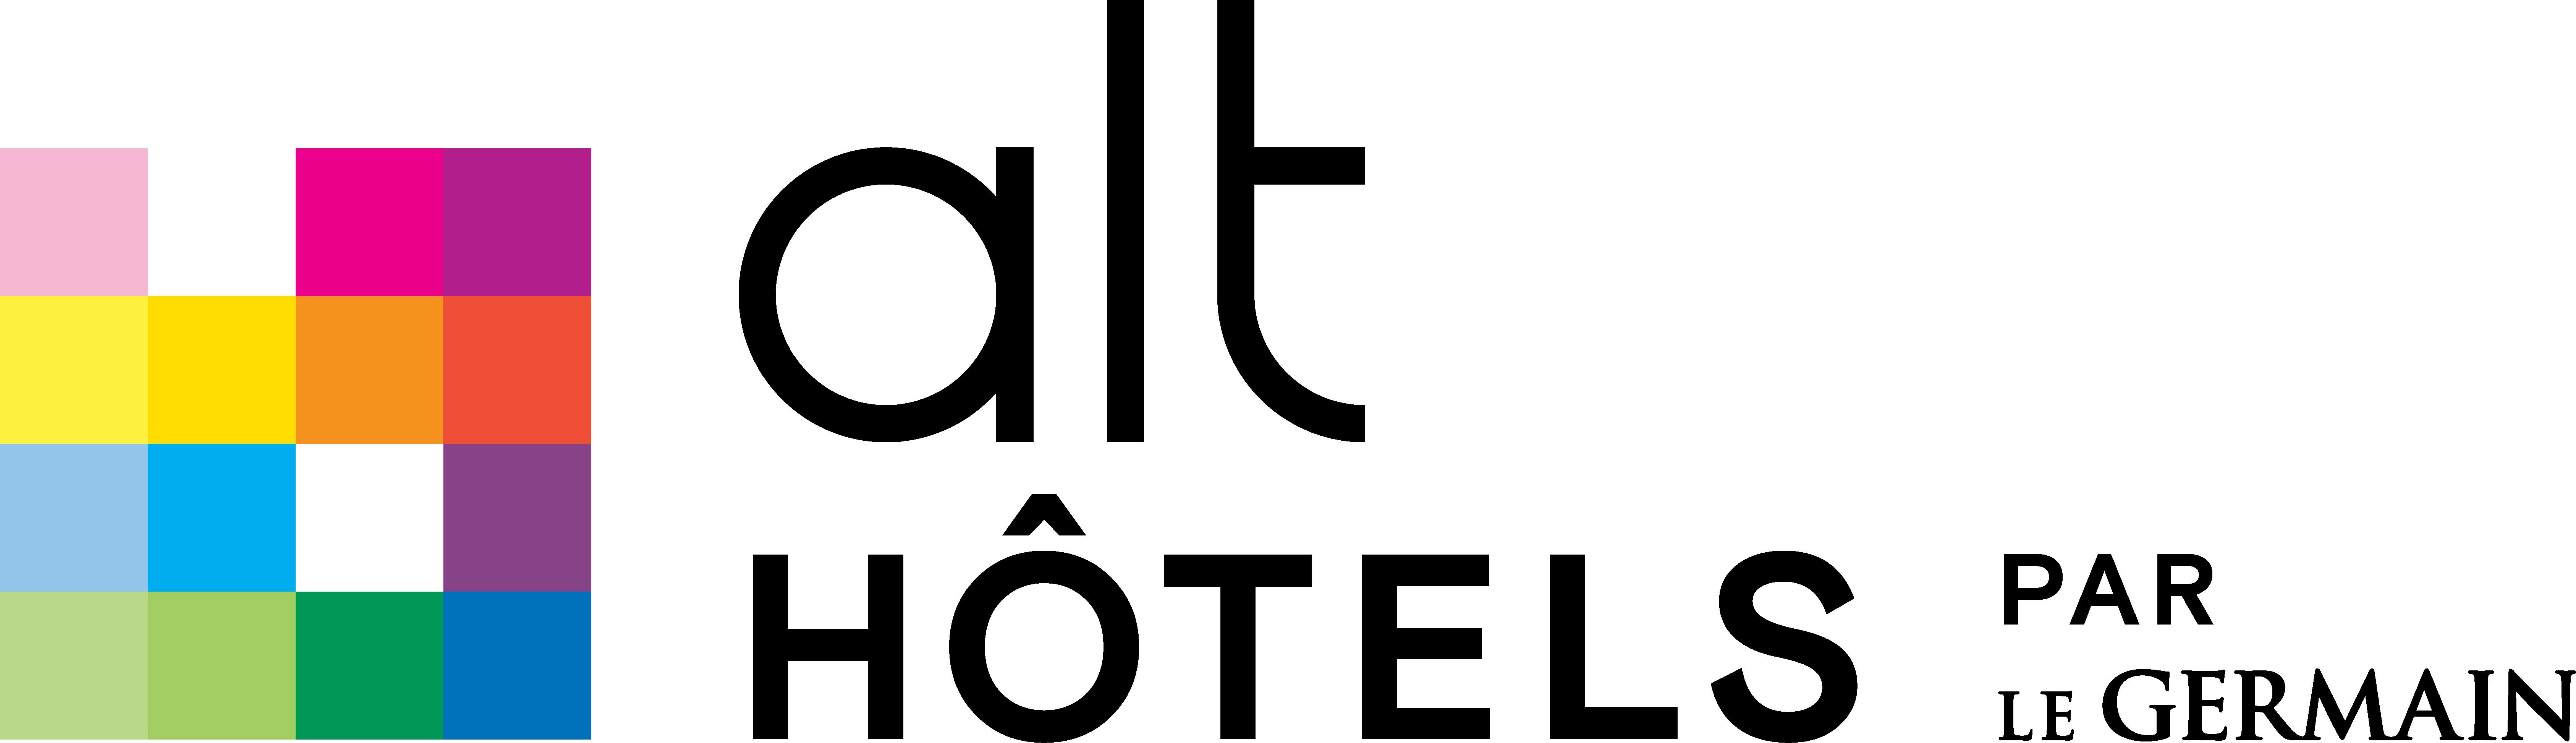 Hôtel alt